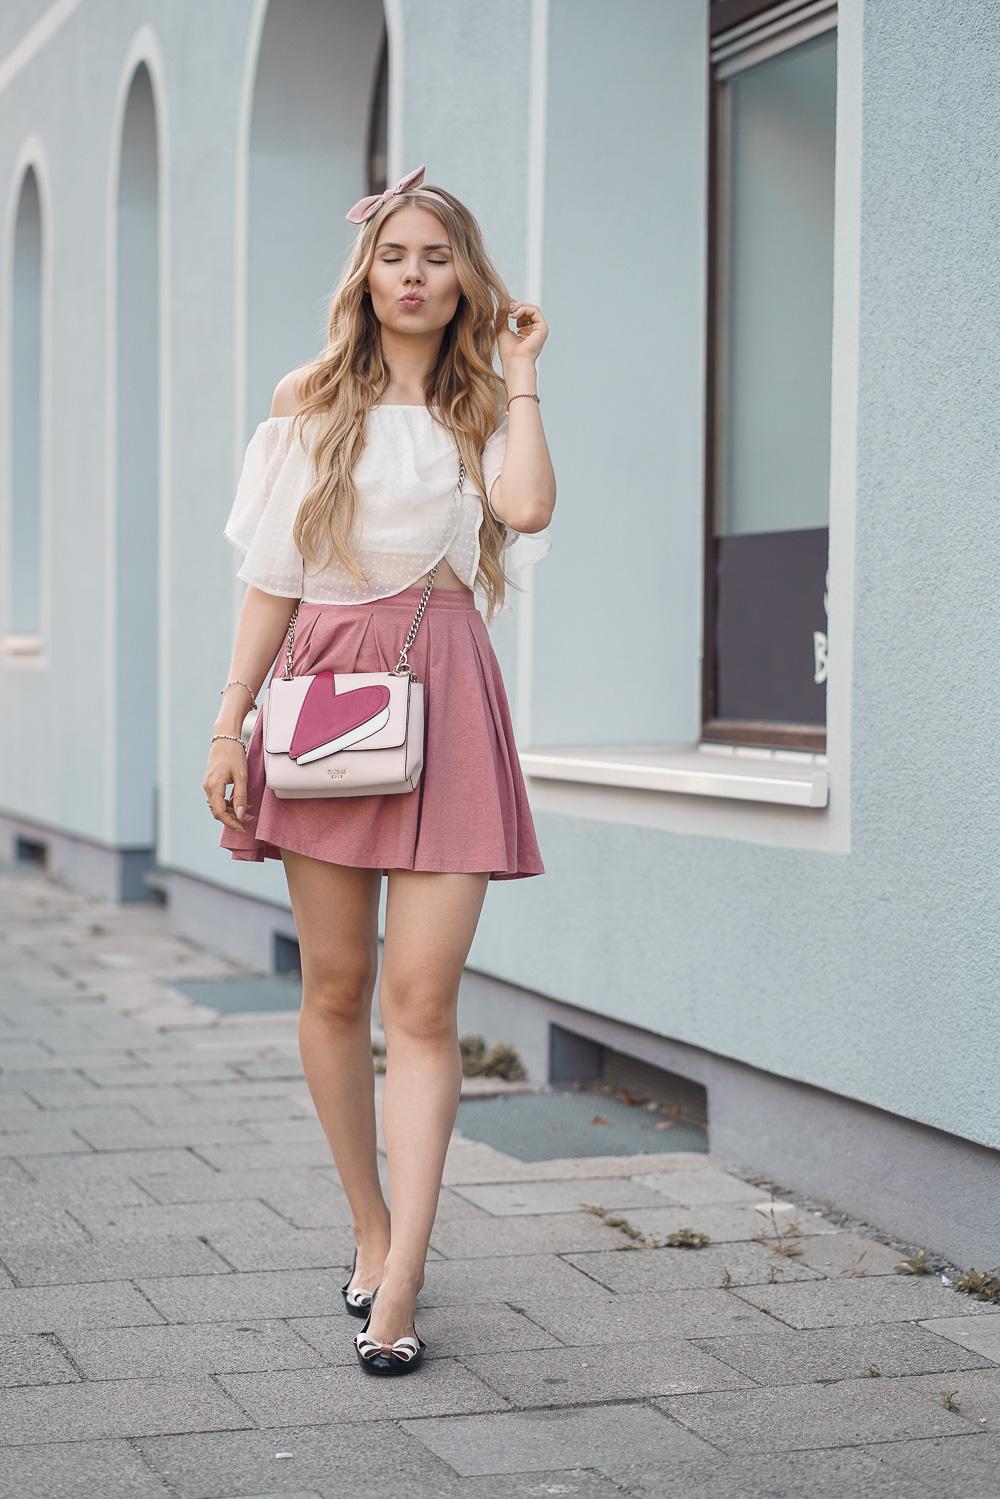 Modebloggerin München-Rose girly Look - rosa Rock, weißes oberteil